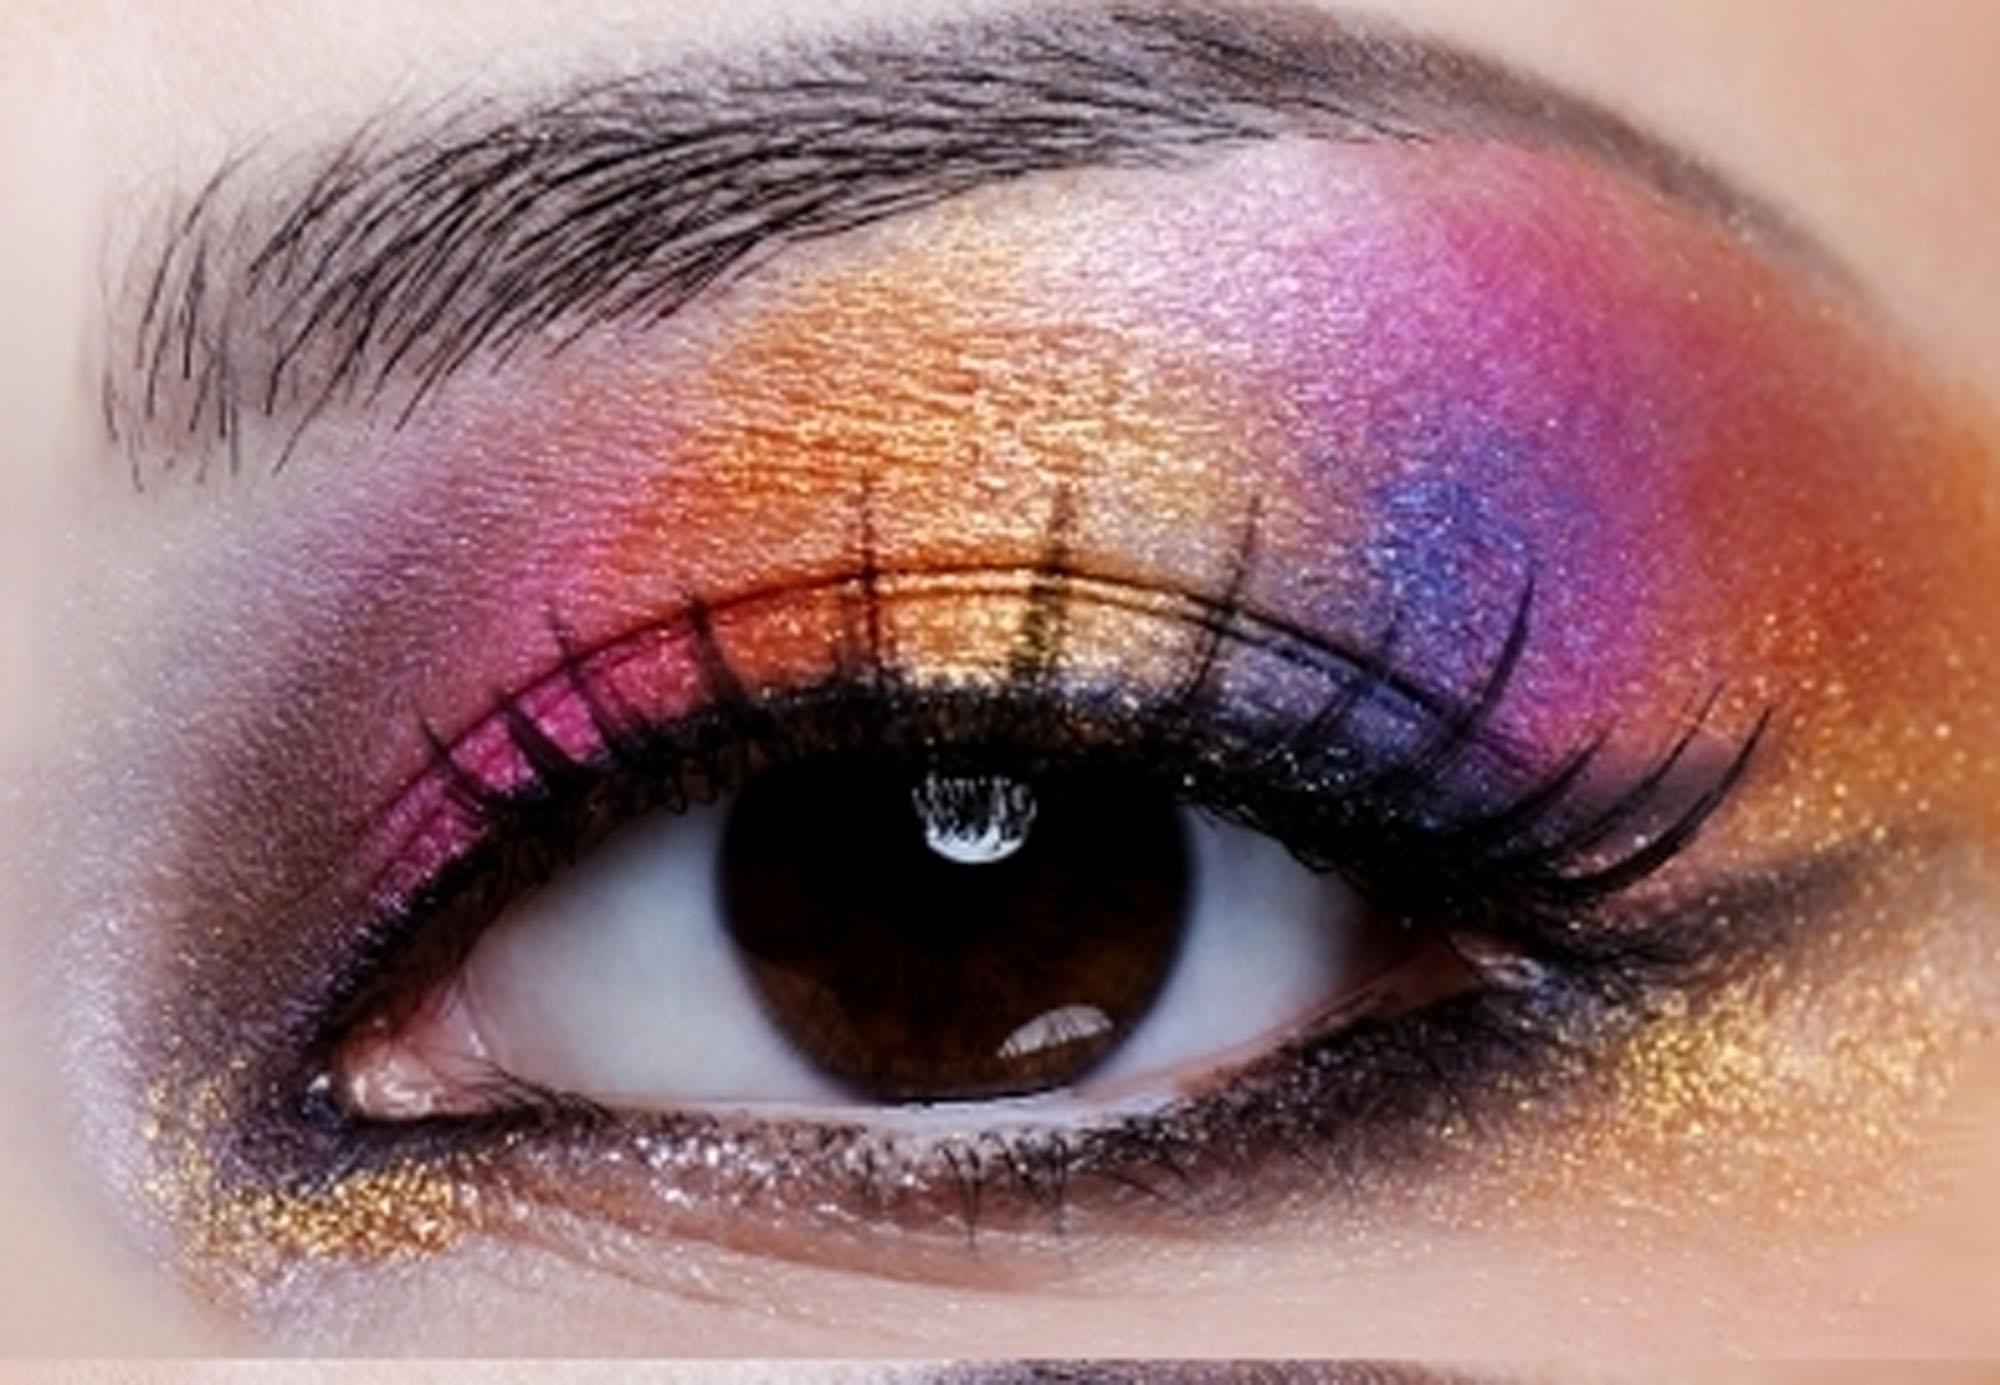 Shimmery Rainbow Eye Makeup as Makeup Ideas for Women